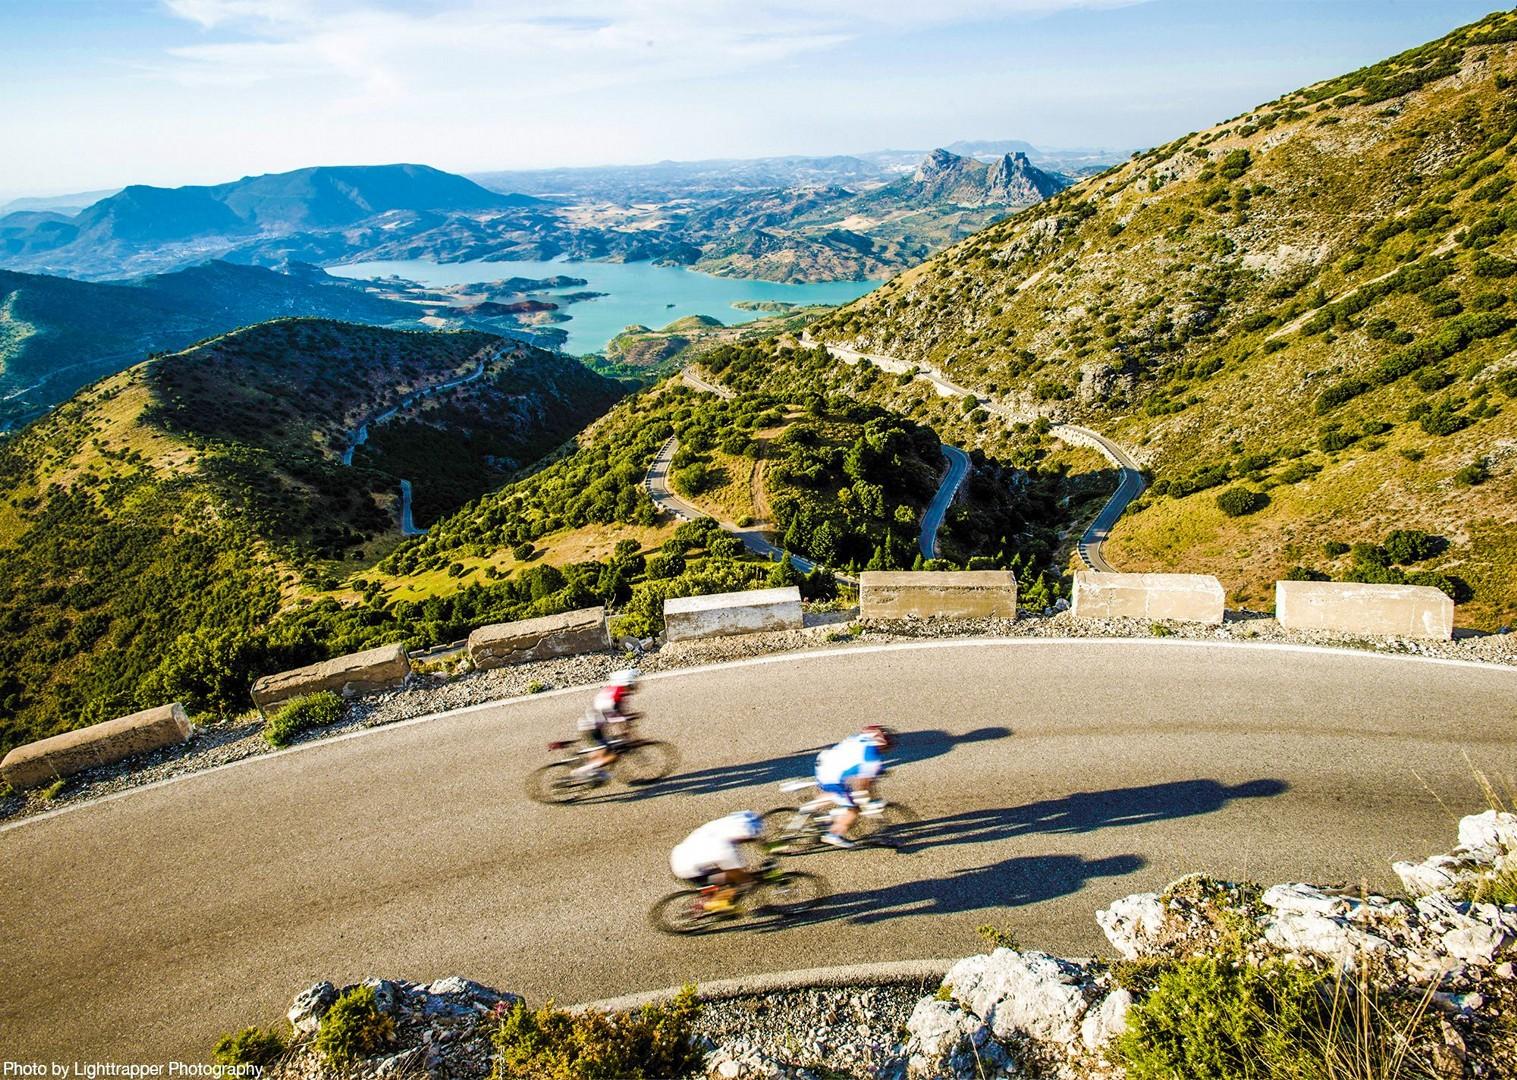 puerto-de-las-palomas-road-cycling-climb-challenge.jpg - Southern Spain - Roads of Ronda - Guided Road Cycling Holiday - Road Cycling